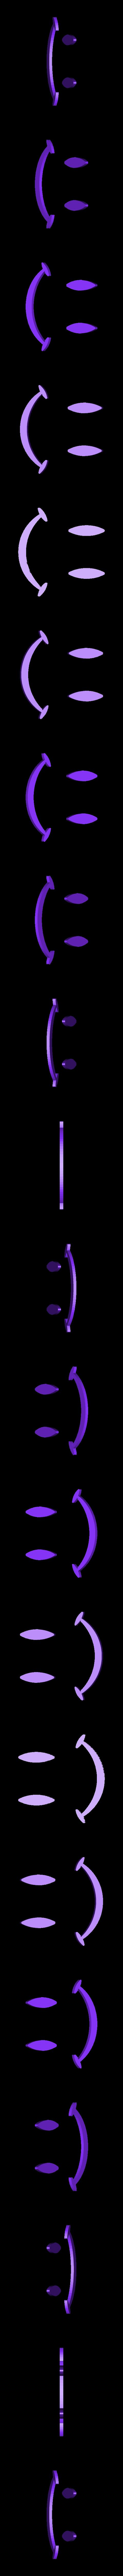 yeux_bouche_2.stl Download STL file Hand Spinner Watchmen • 3D printer model, Guich